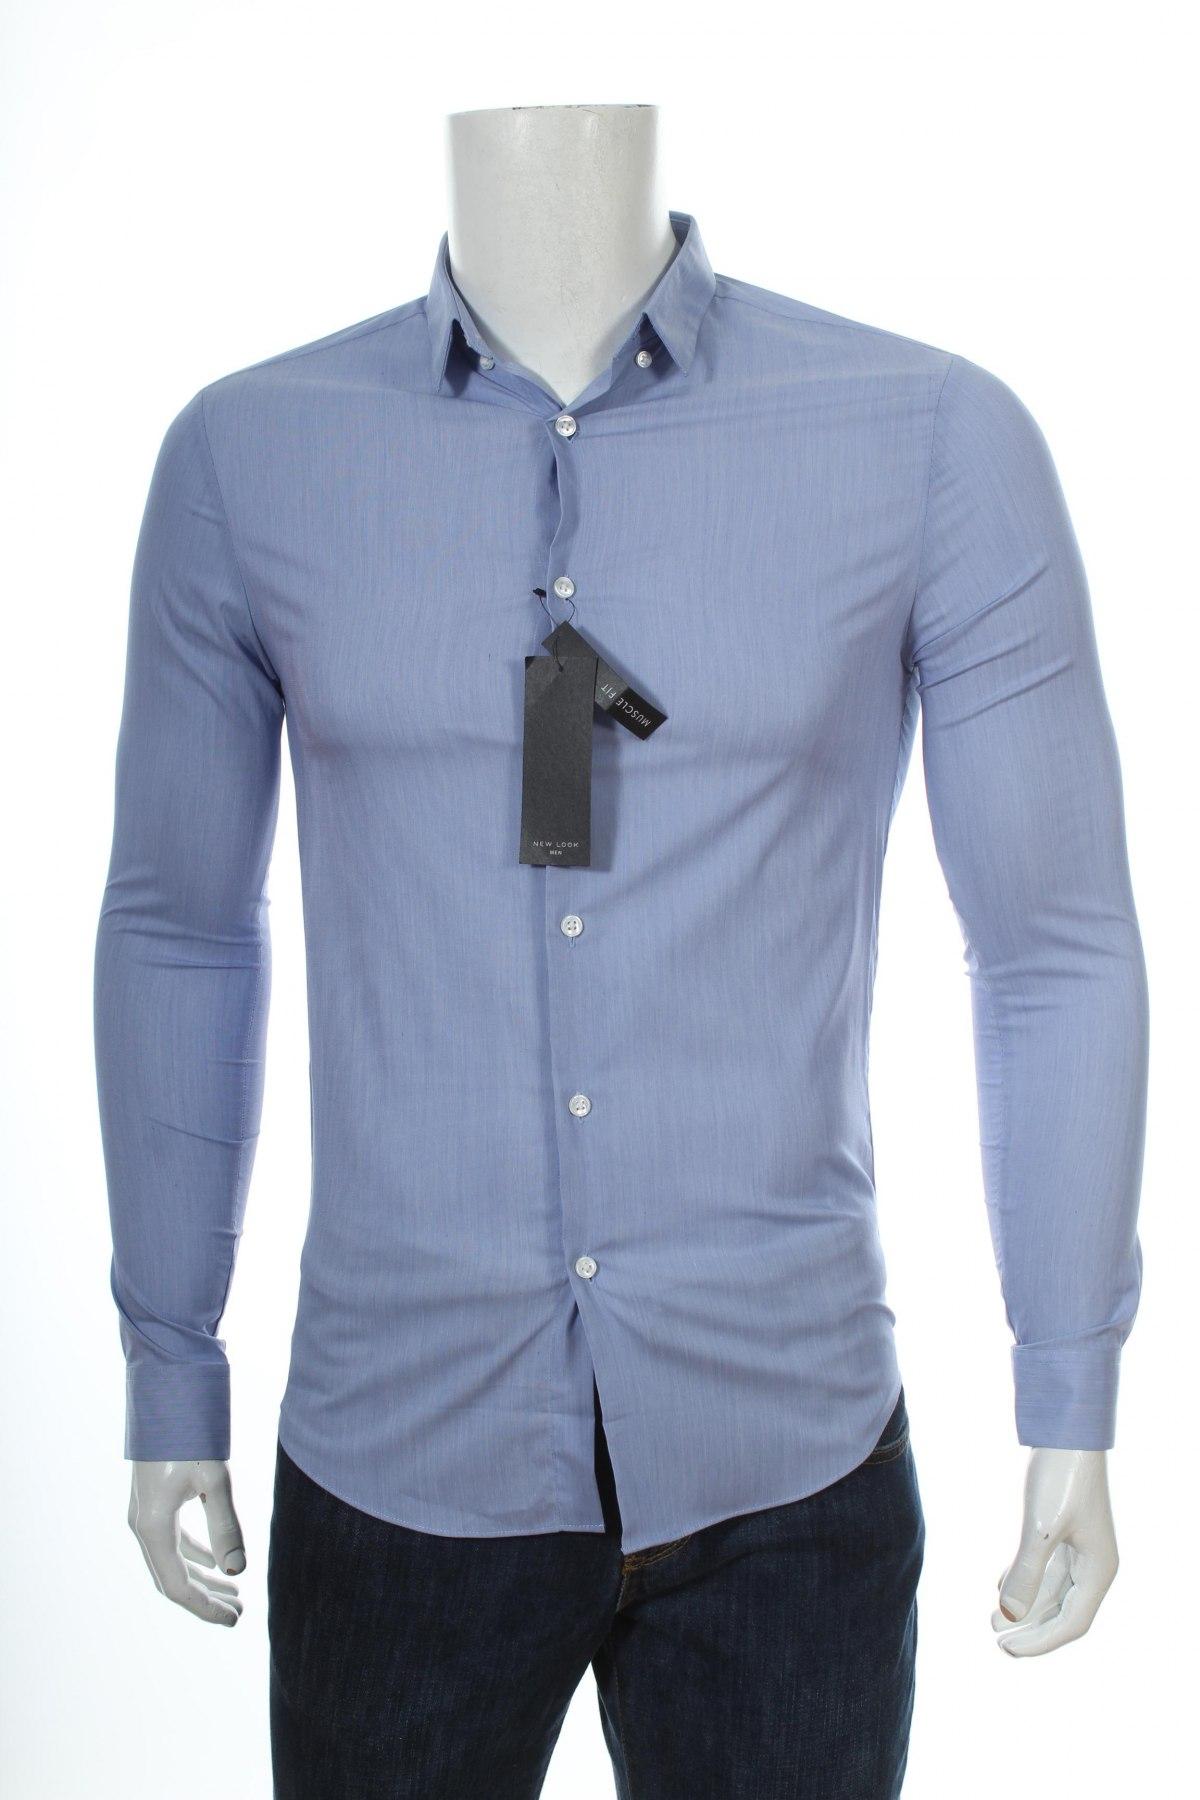 9f651c0d439d Ανδρικό πουκάμισο New Look - σε συμφέρουσα τιμή στο Remix -  103662056